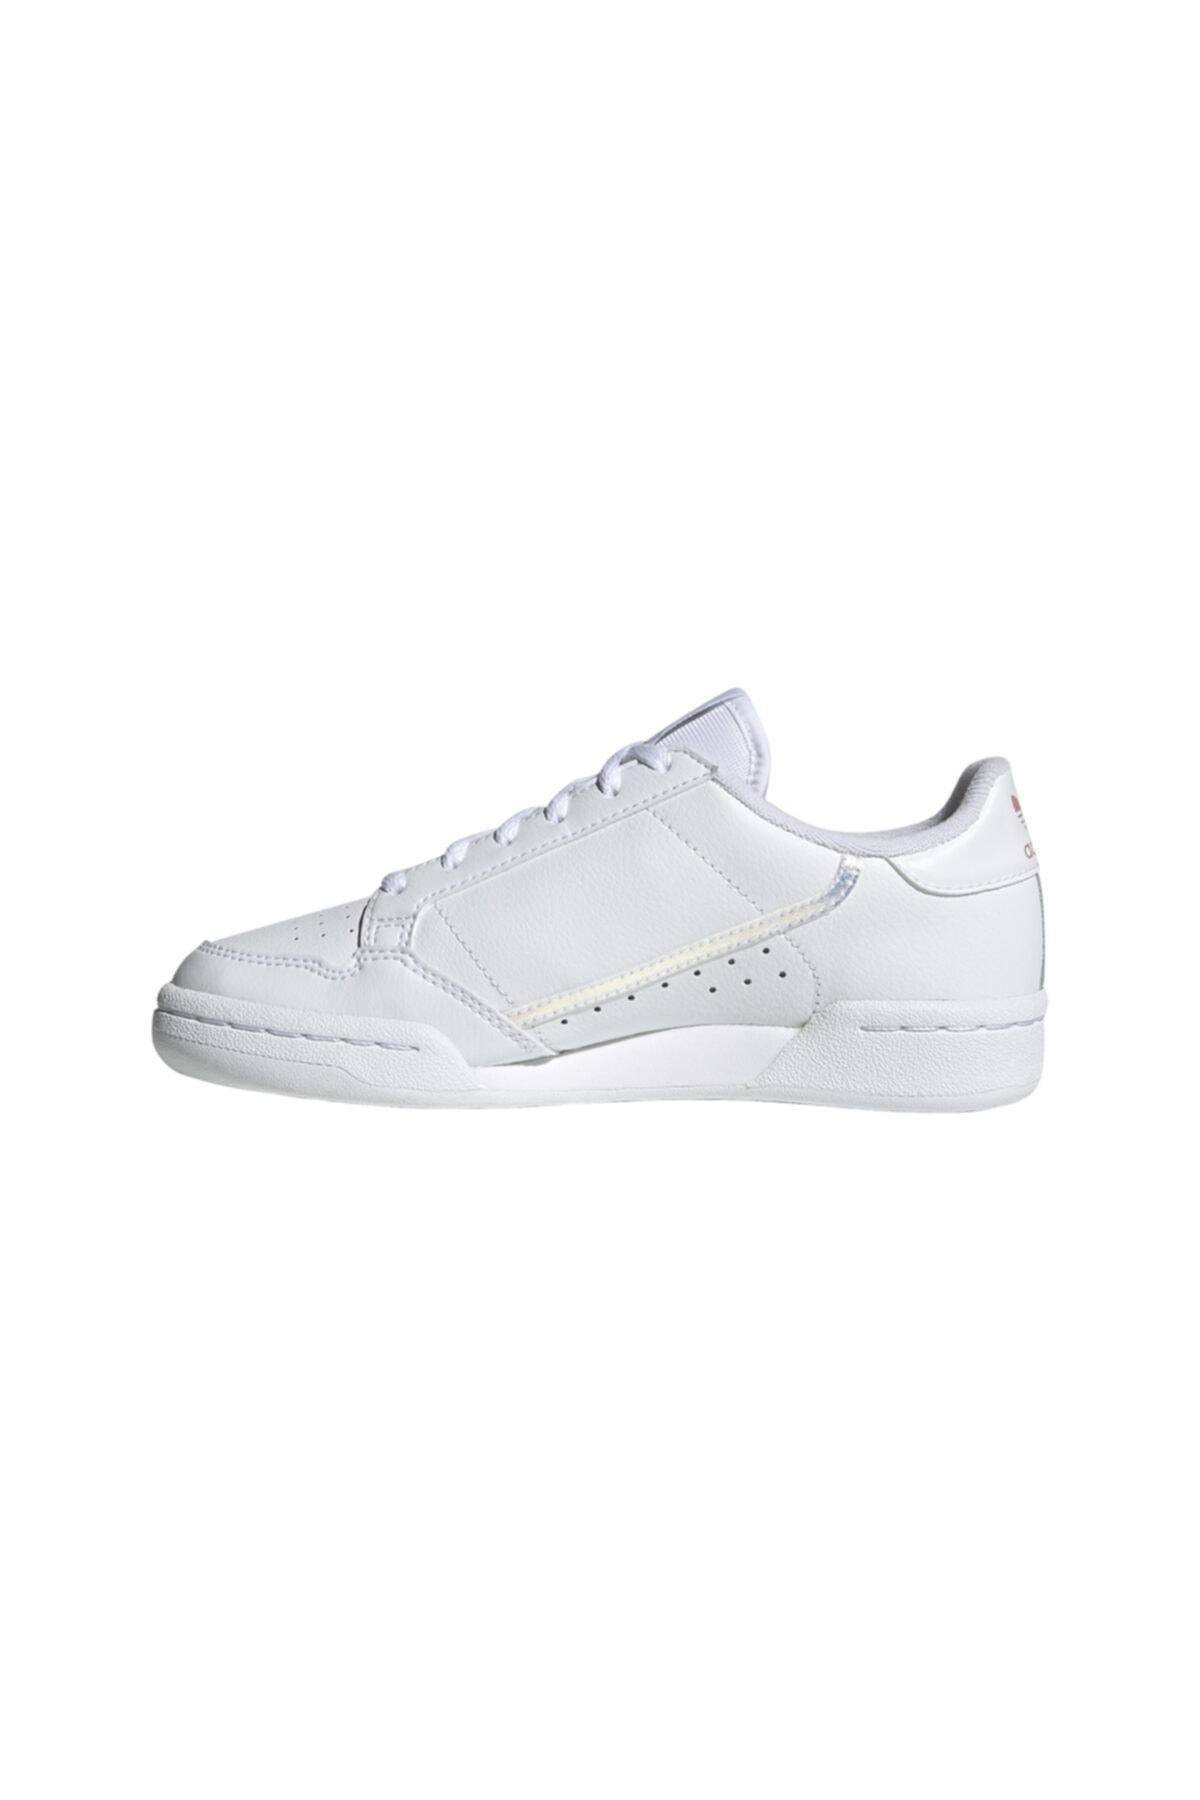 adidas Continental 80 Fw20 (GS) Spor Ayakkabı 2